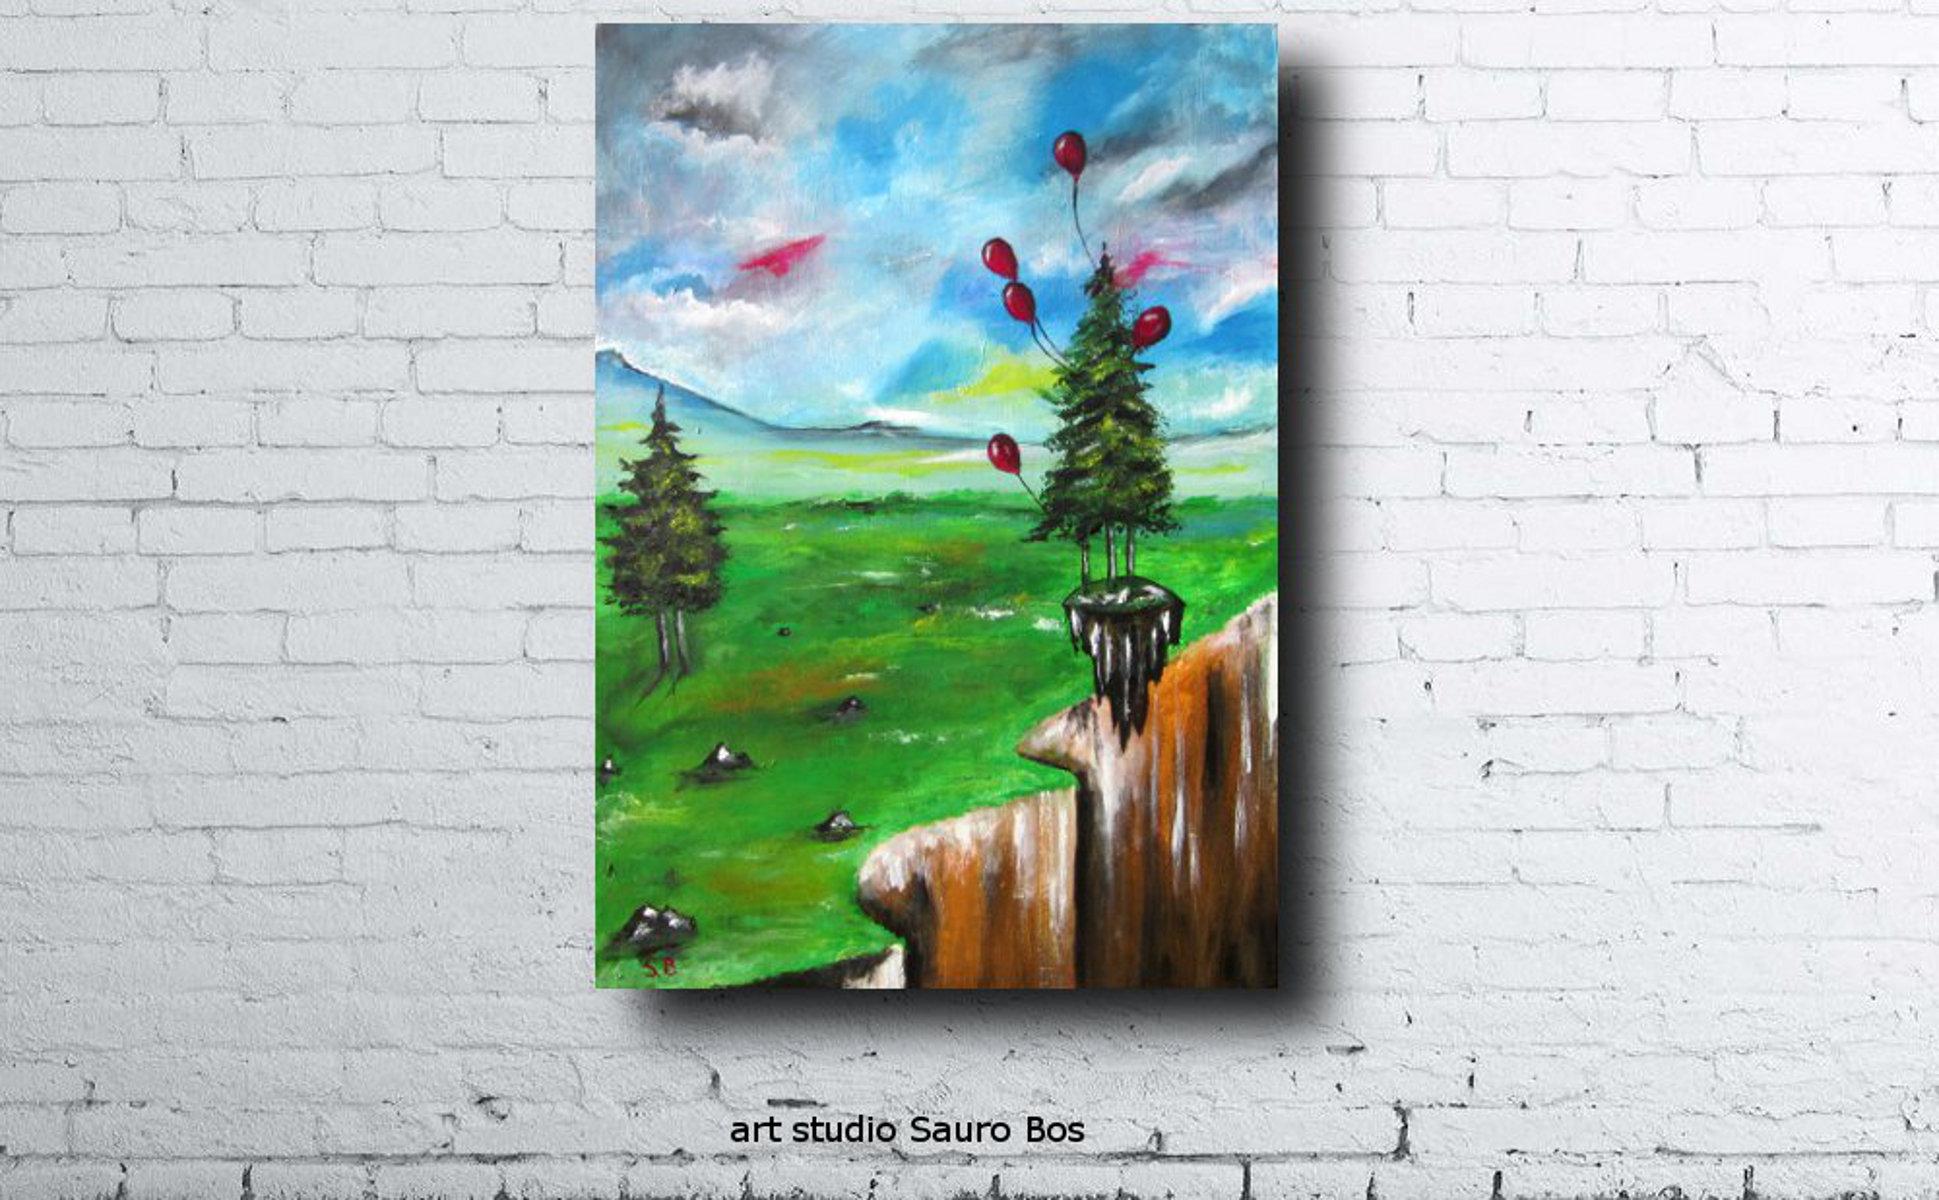 palloncini salva alberomuro - dipinto surreale titolo palloncini salva albero-70x50